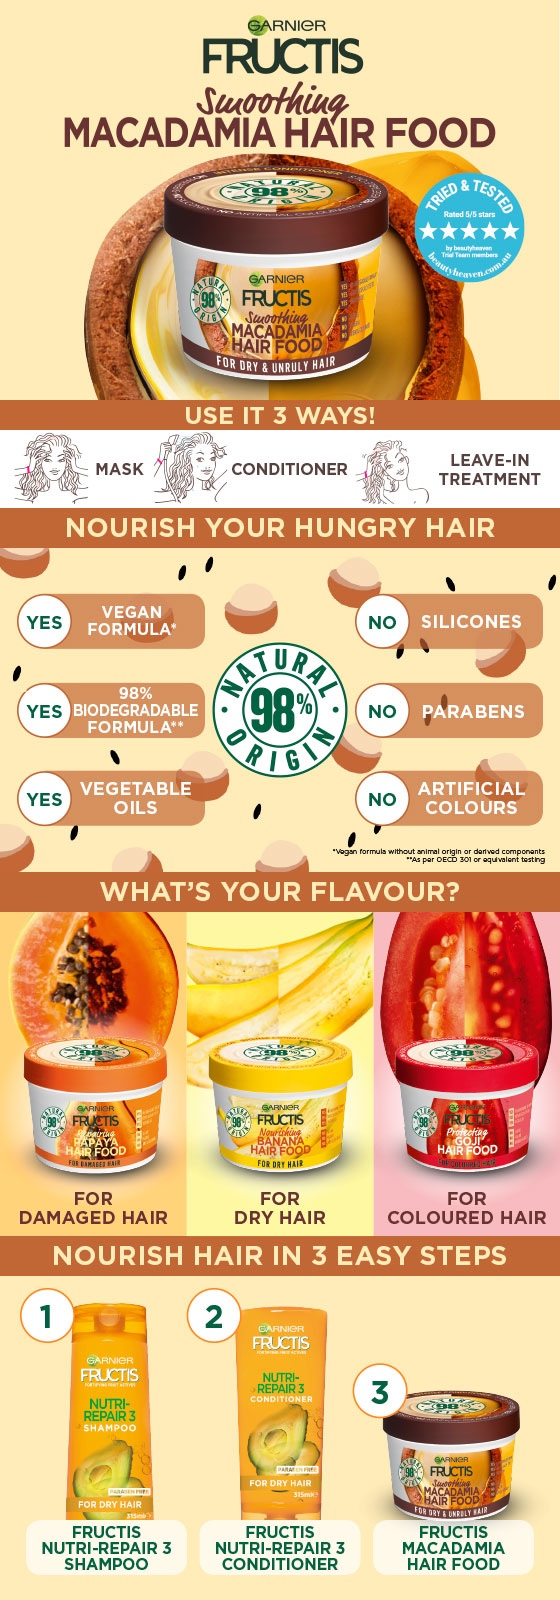 Garnier Fructis Smoothing Macadamia Hair Food